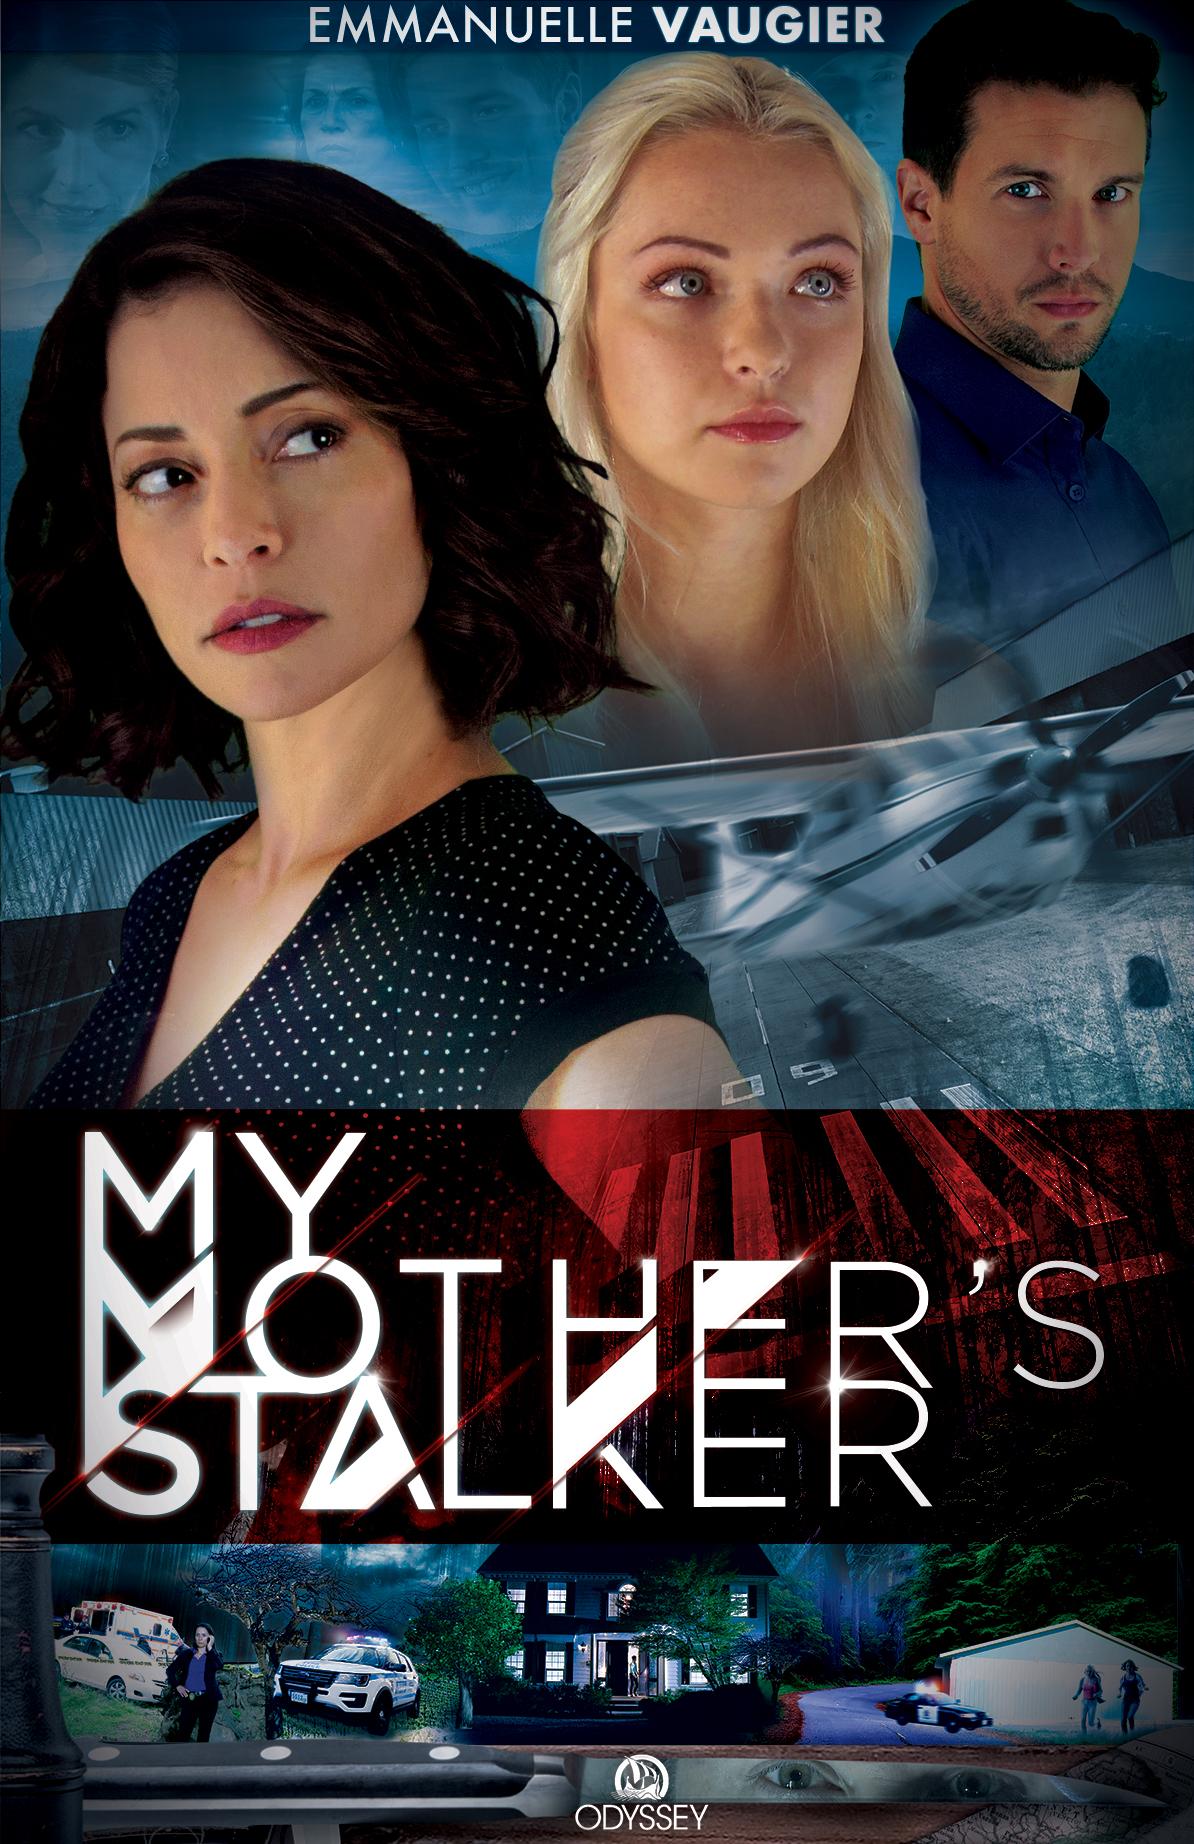 My Mother's Stalker (2019) - IMDb